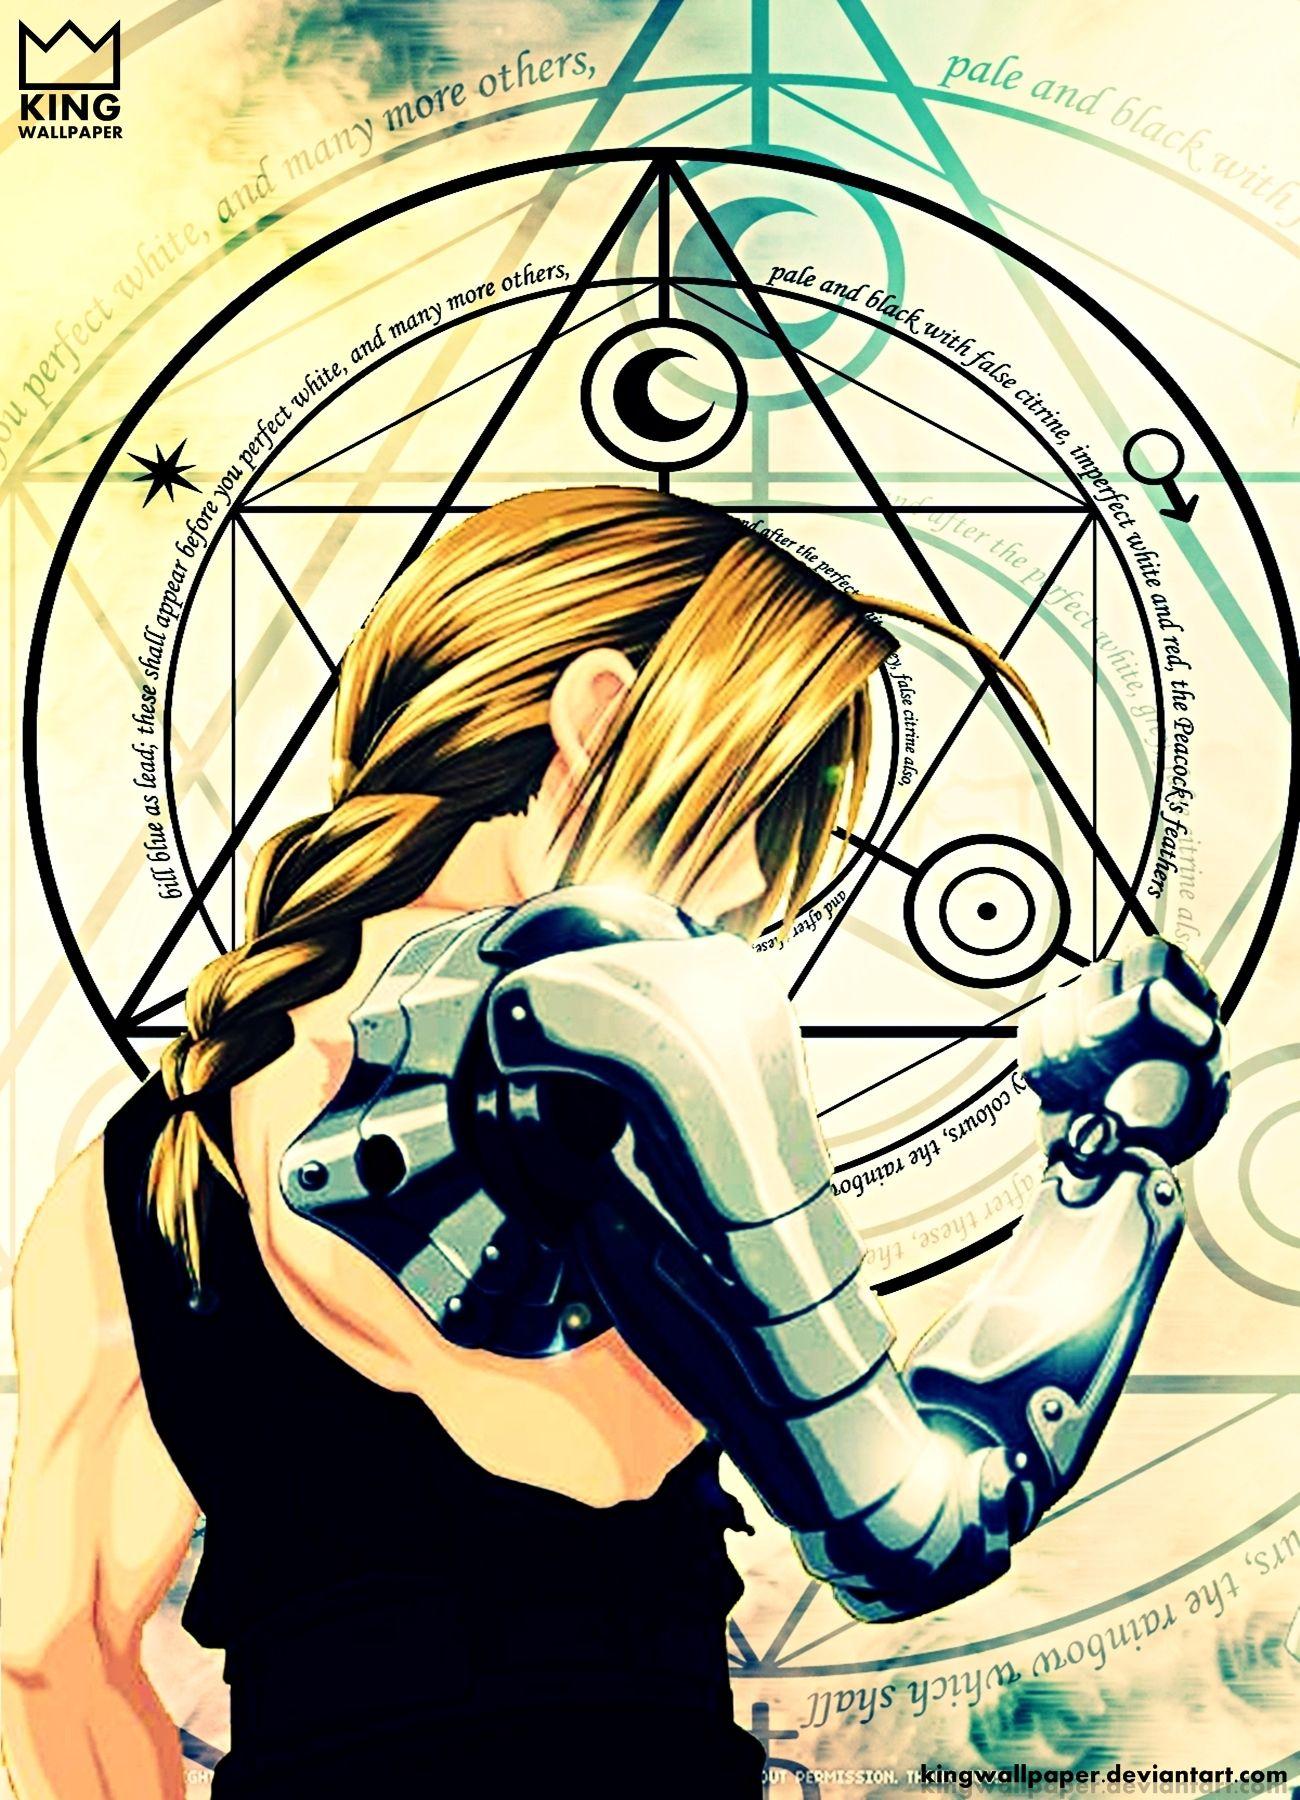 Fullmetal Alchemist Wallpaper By Kingwallpaper